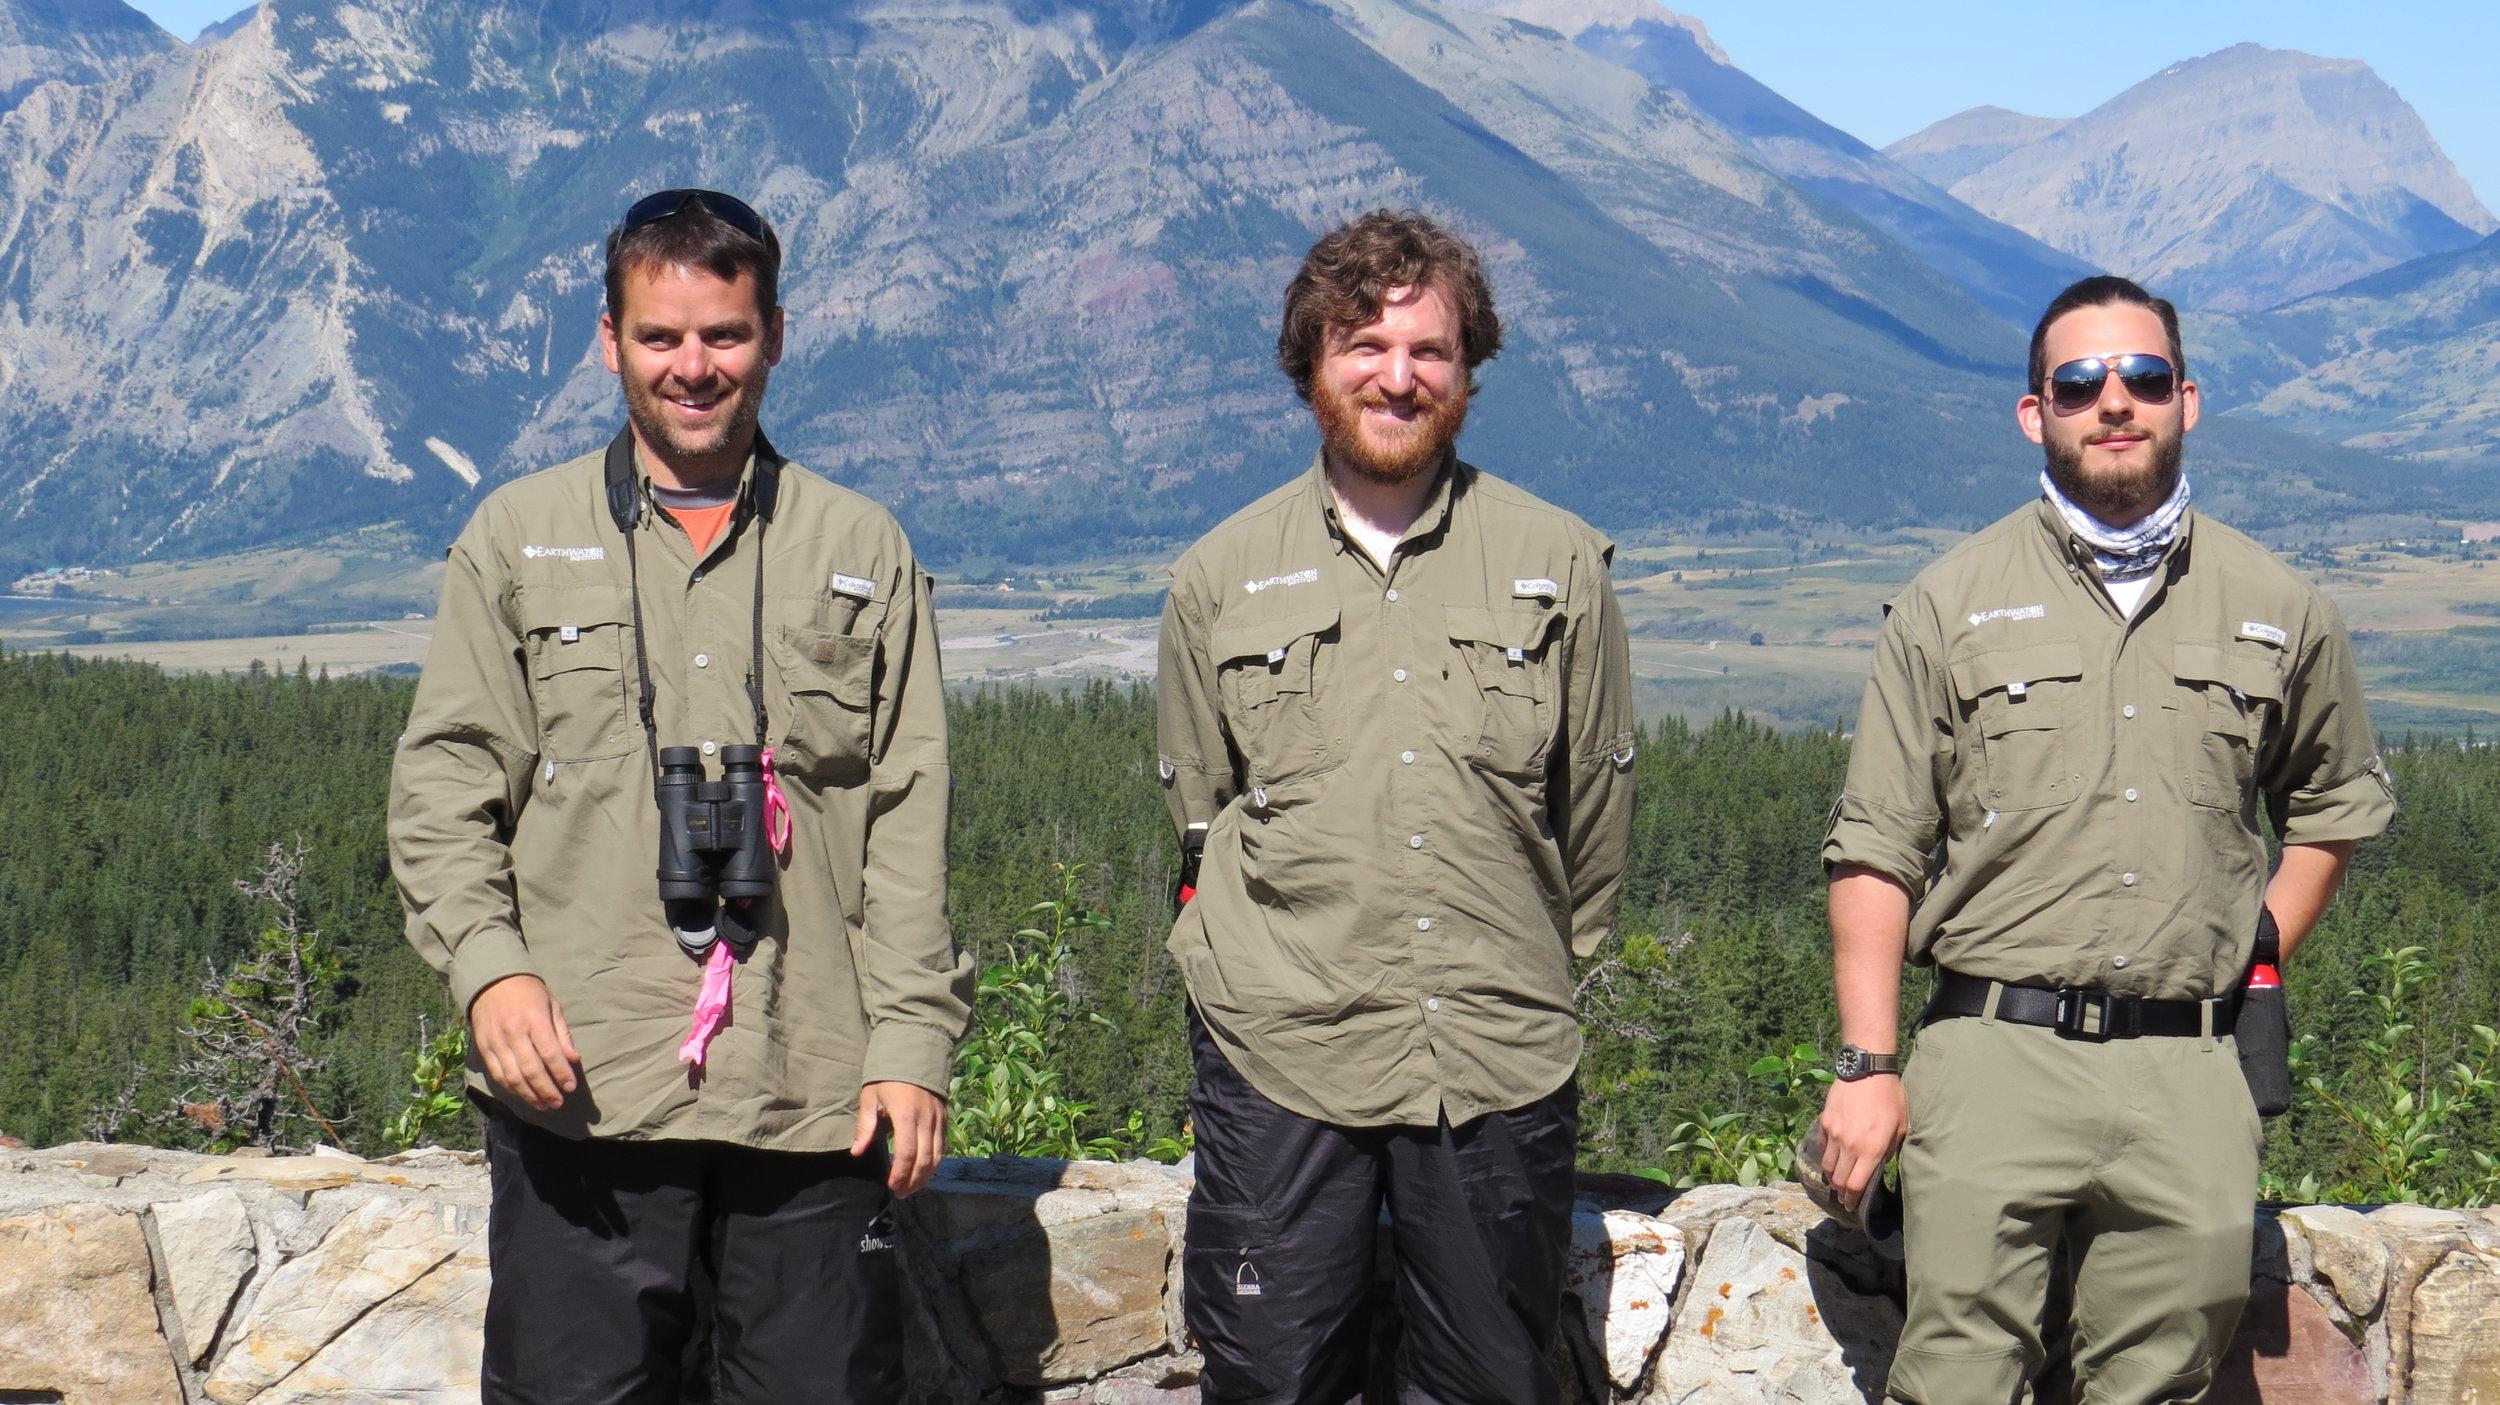 Millennials Chris Anderson, Jason Kirkey, and Corwin Scott Working on an Earthwatch Project, Photo by Cristina Eisenberg